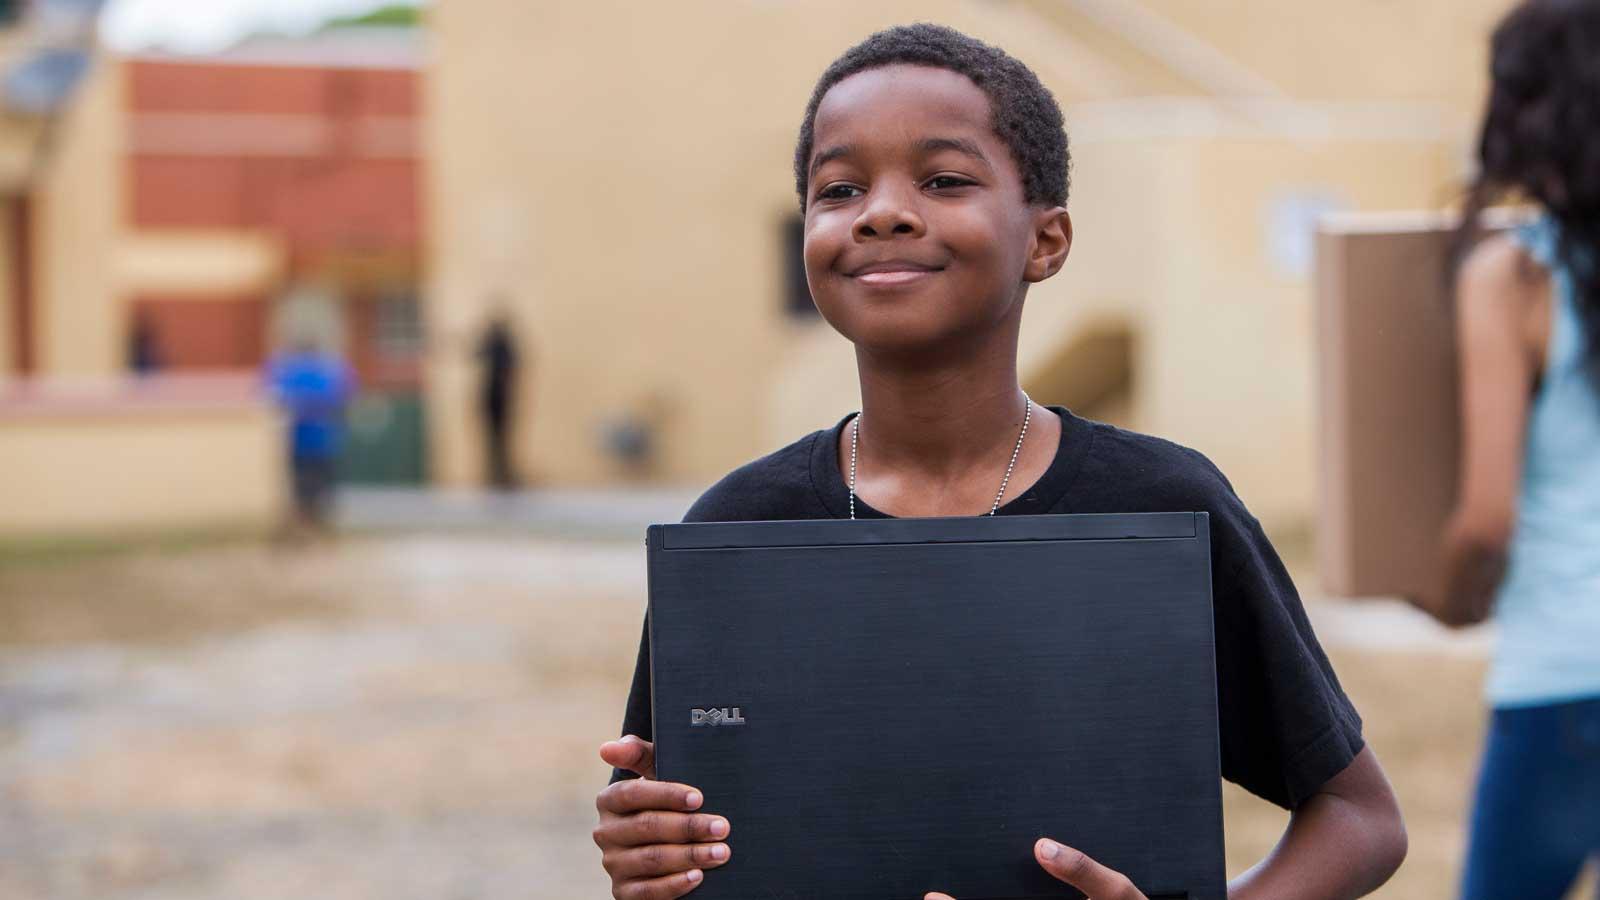 Boy holding laptop